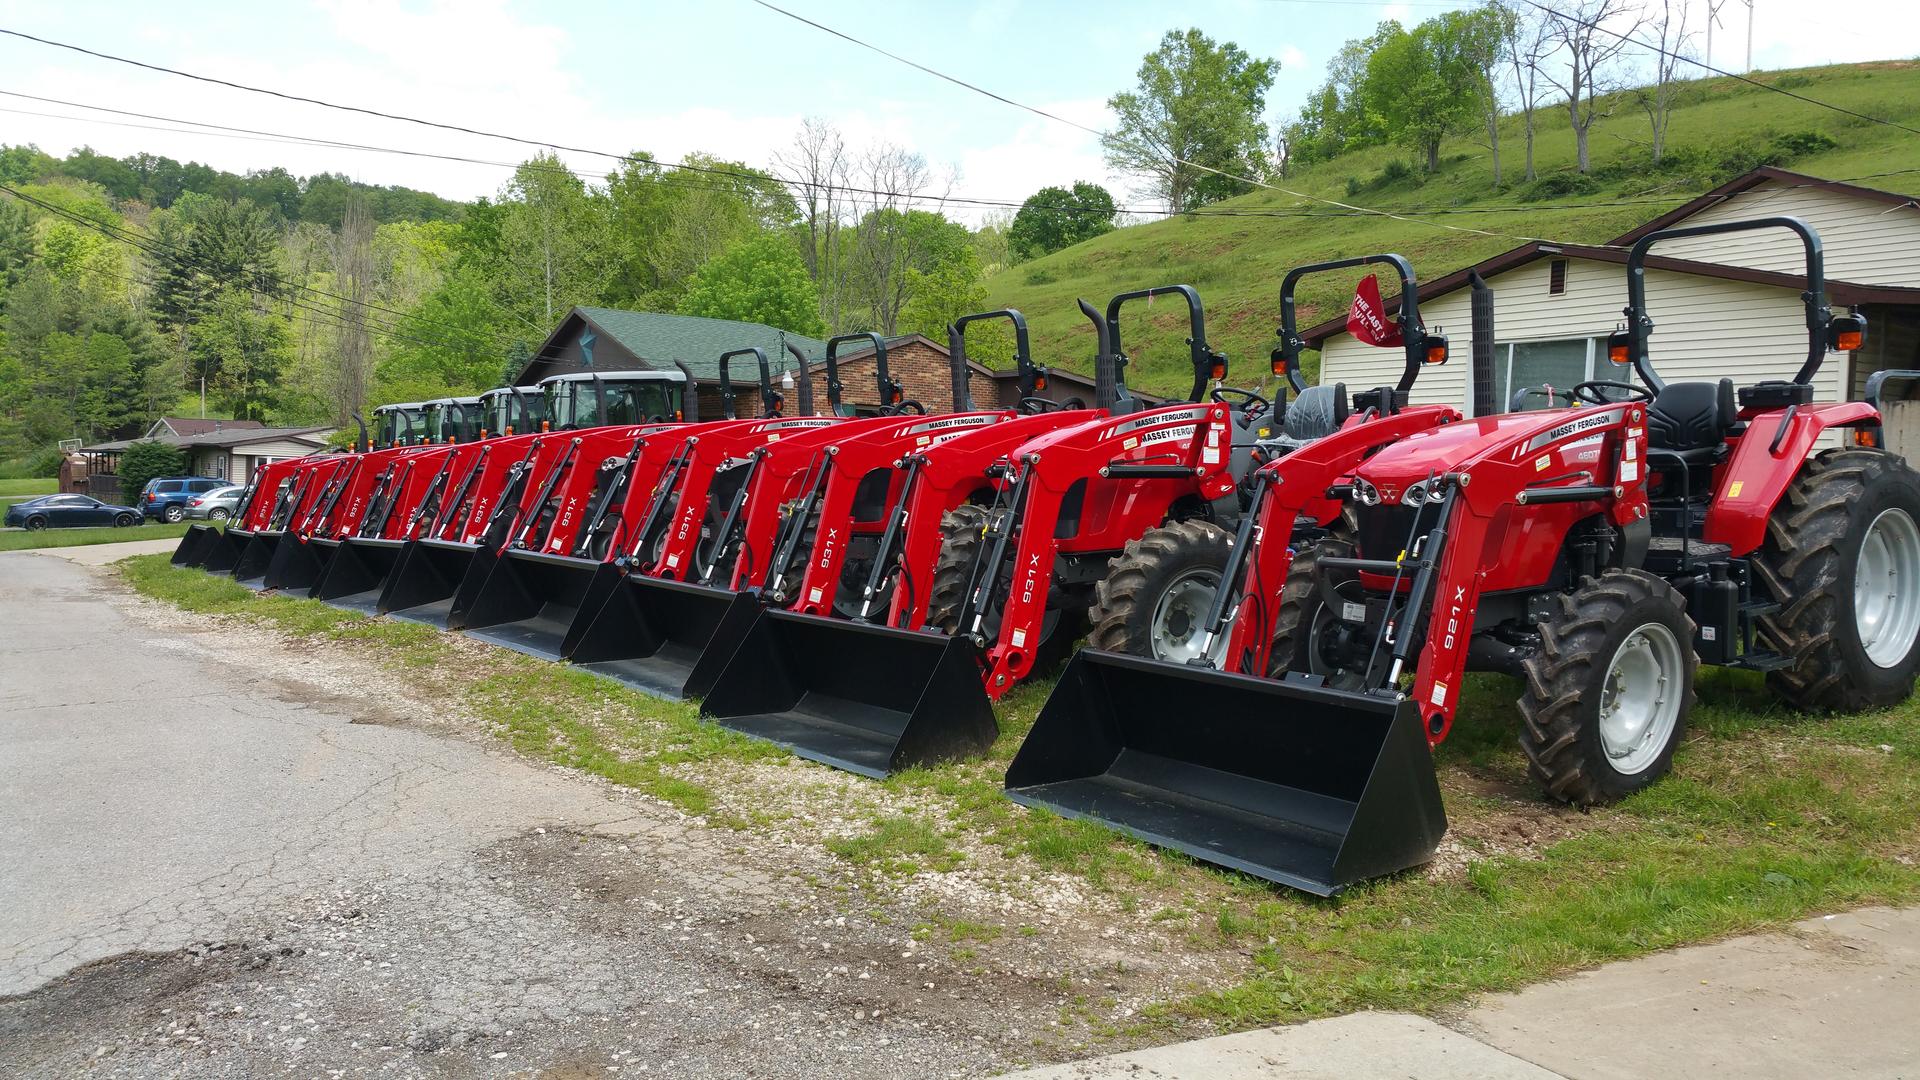 lemons farm equipment tractor supply farm massey ferguson